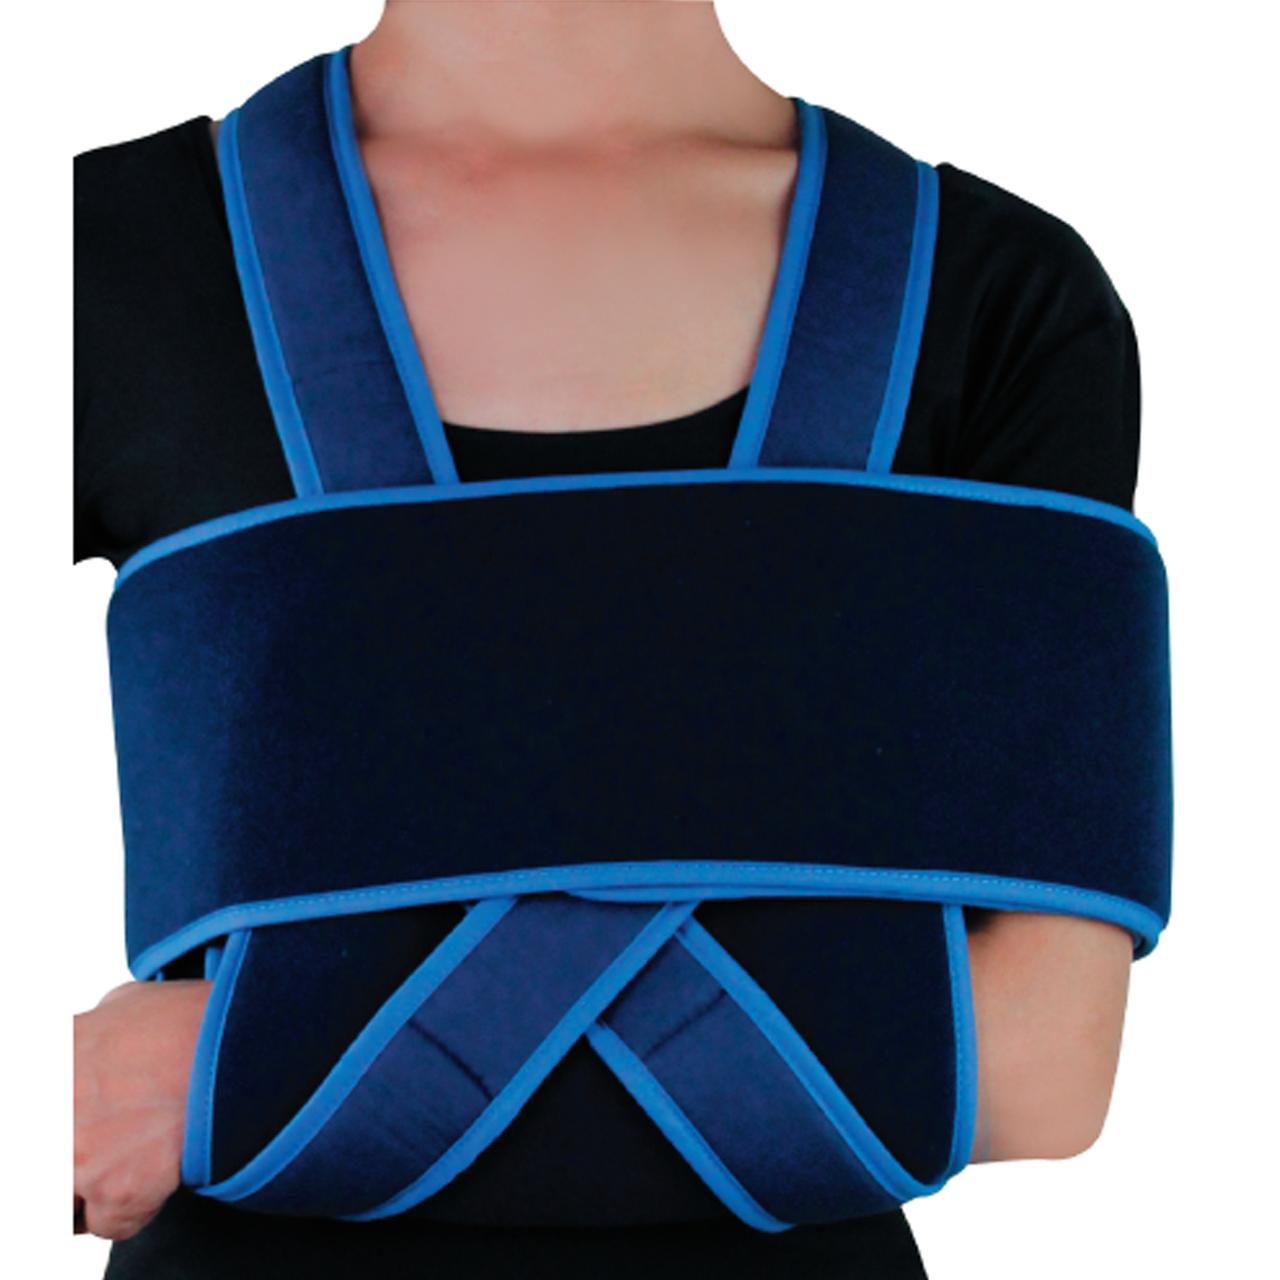 Бандаж фиксирующий на плечевой сустав (повязка Дезо), S/M